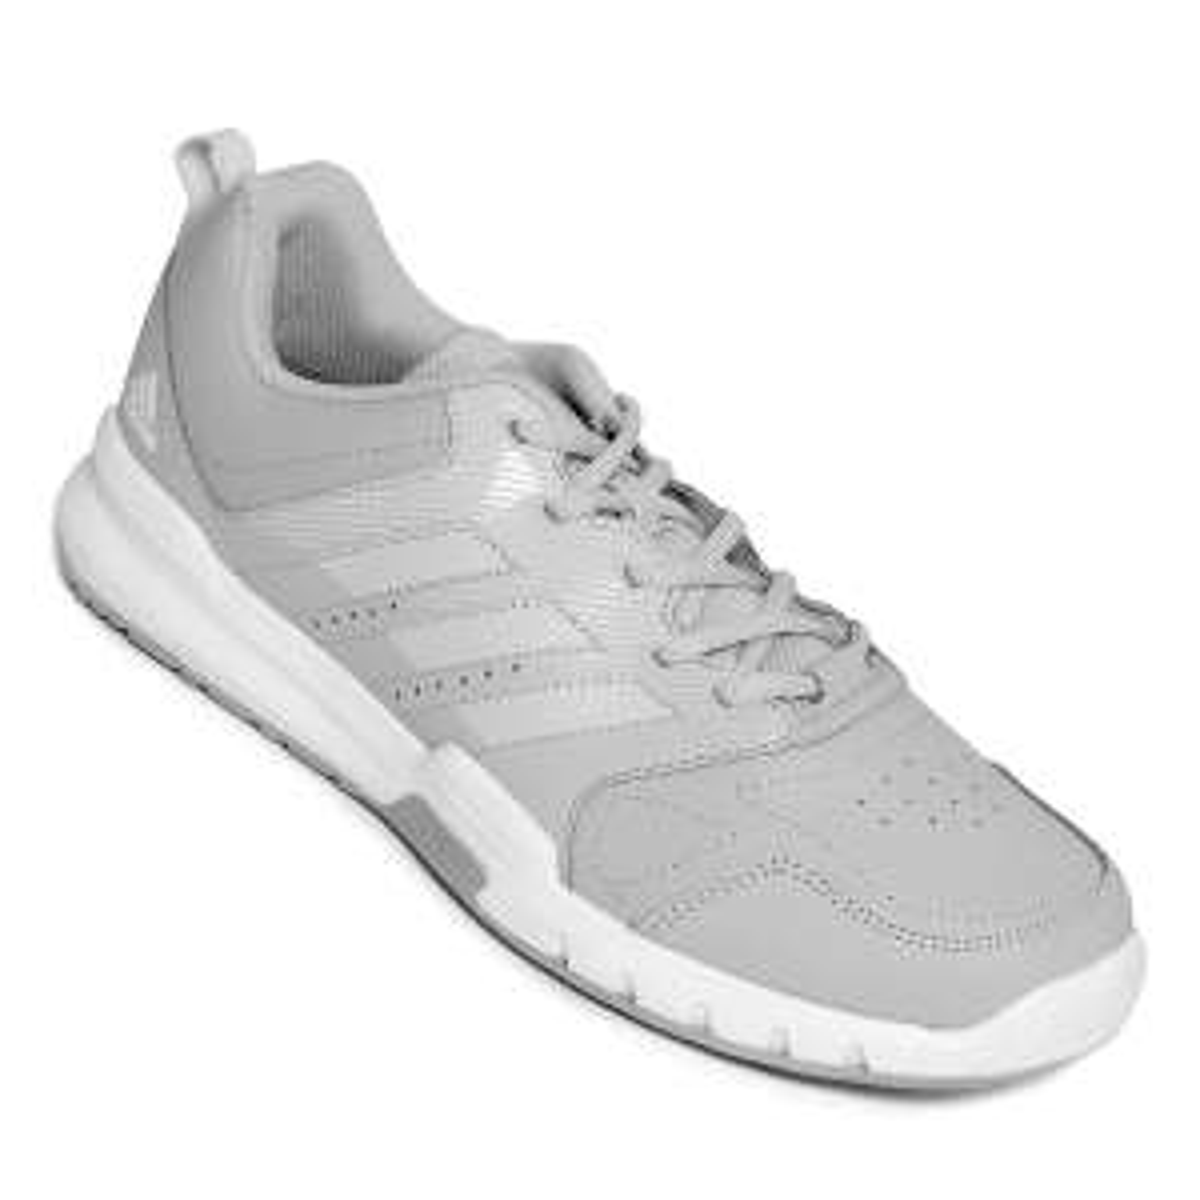 Netshoes: Tenis Adidas Essential Star - (7, 7.5 y 8 MX)